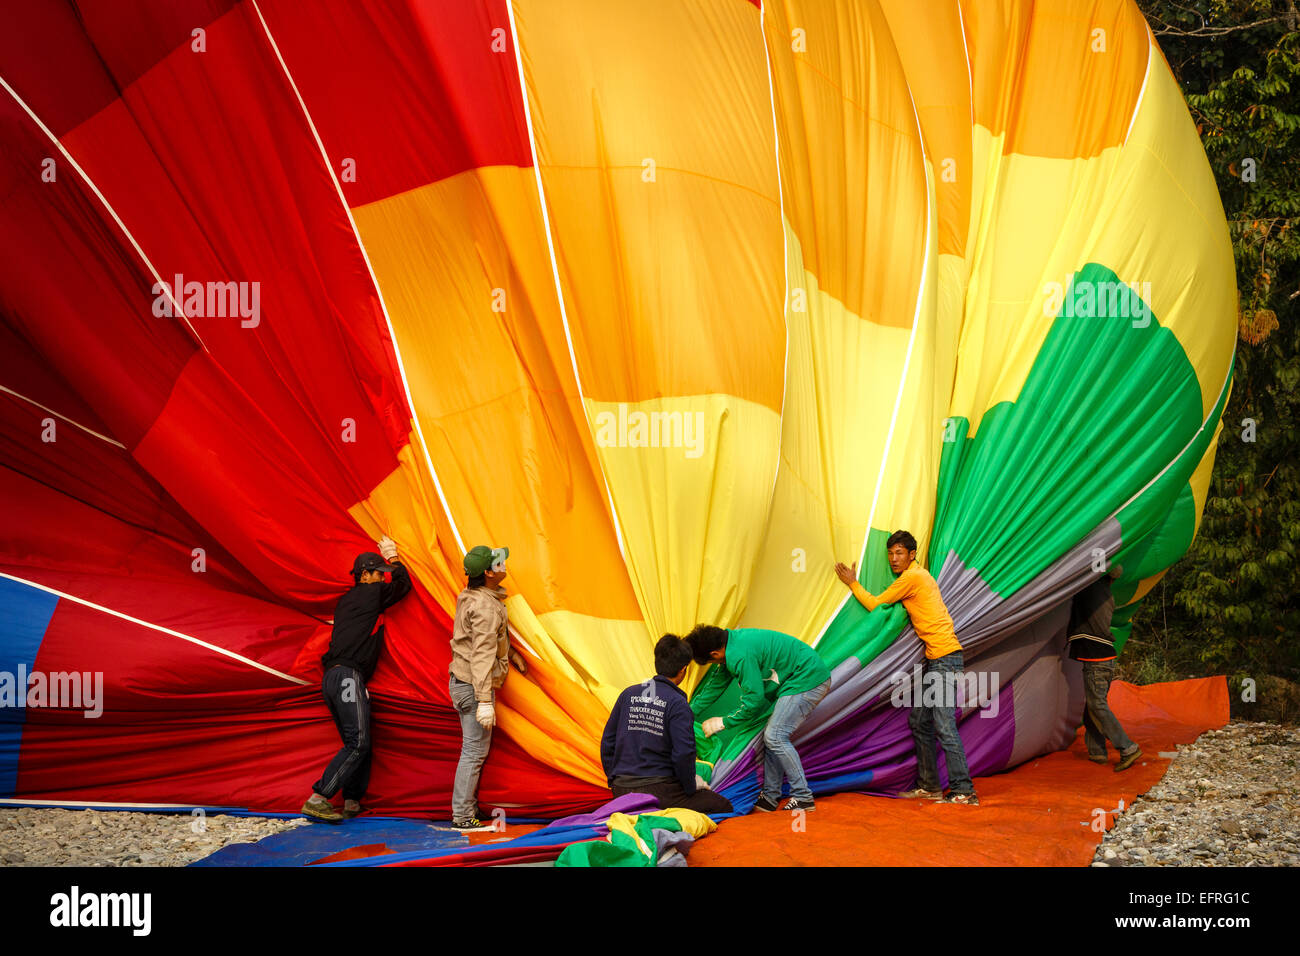 Menschen, die Falten ein Heißluft-Ballon, Vang Vieng, Laos. Stockbild